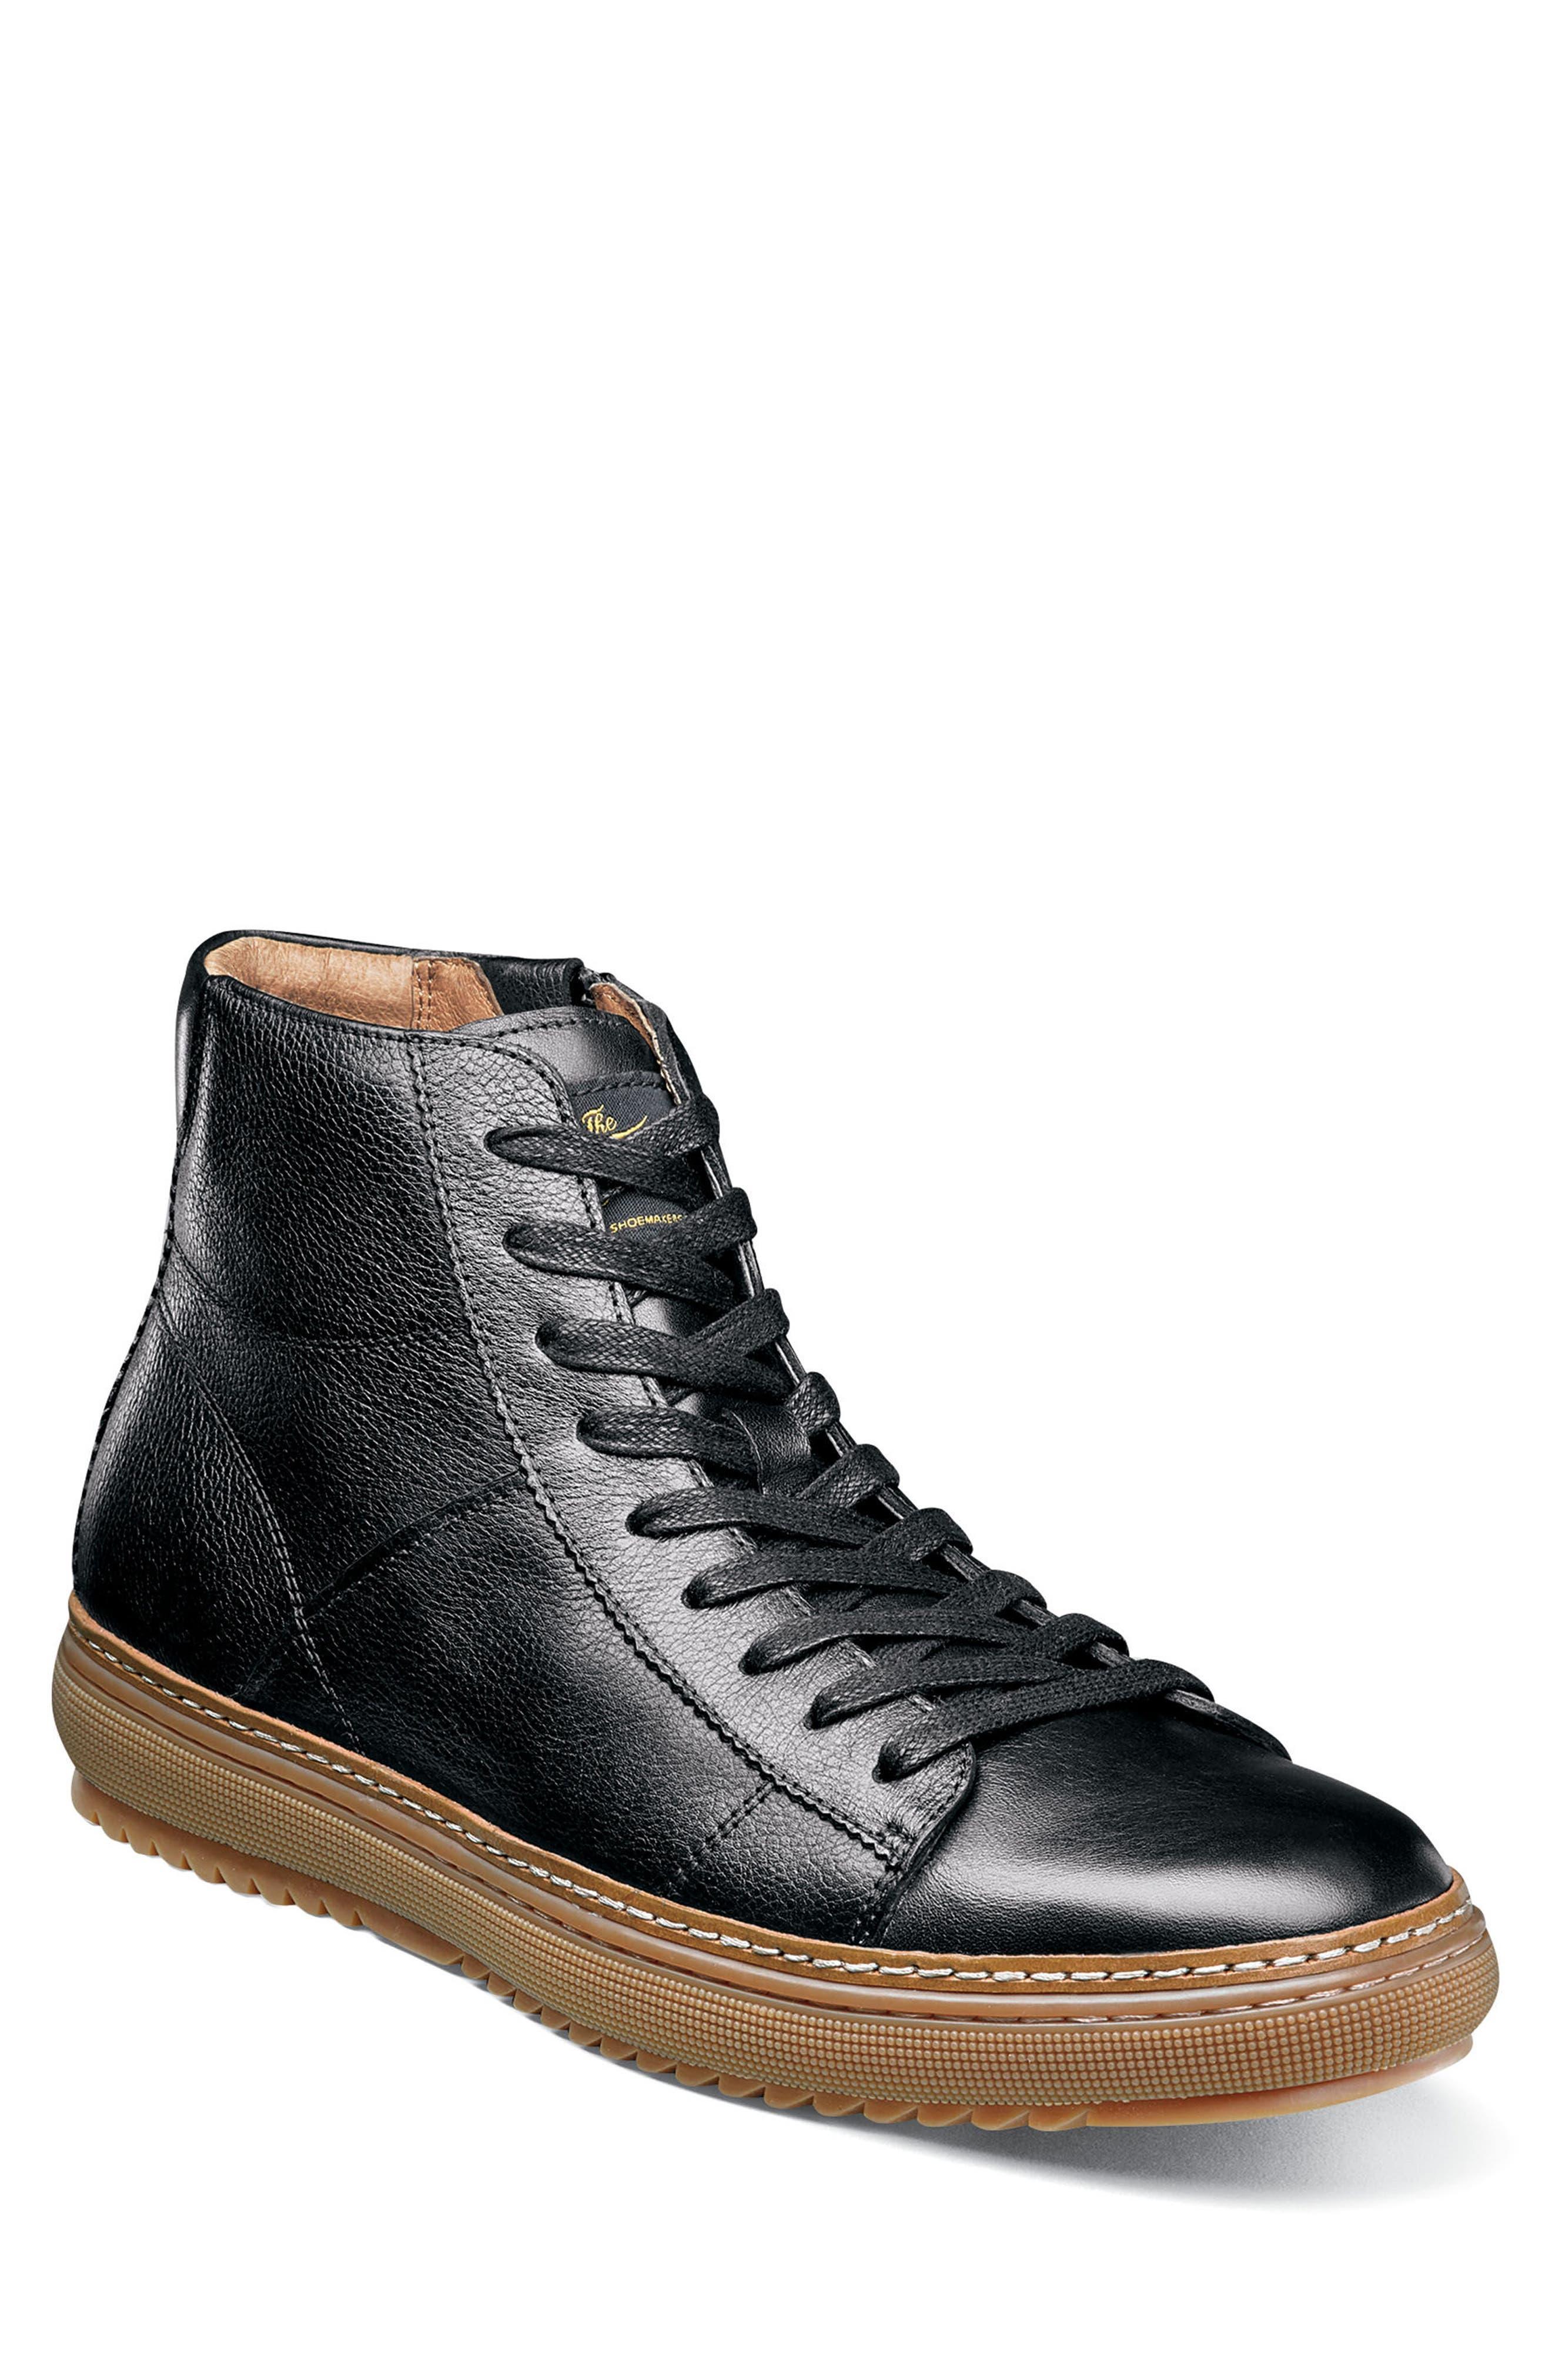 Crew Sneaker,                         Main,                         color, Black